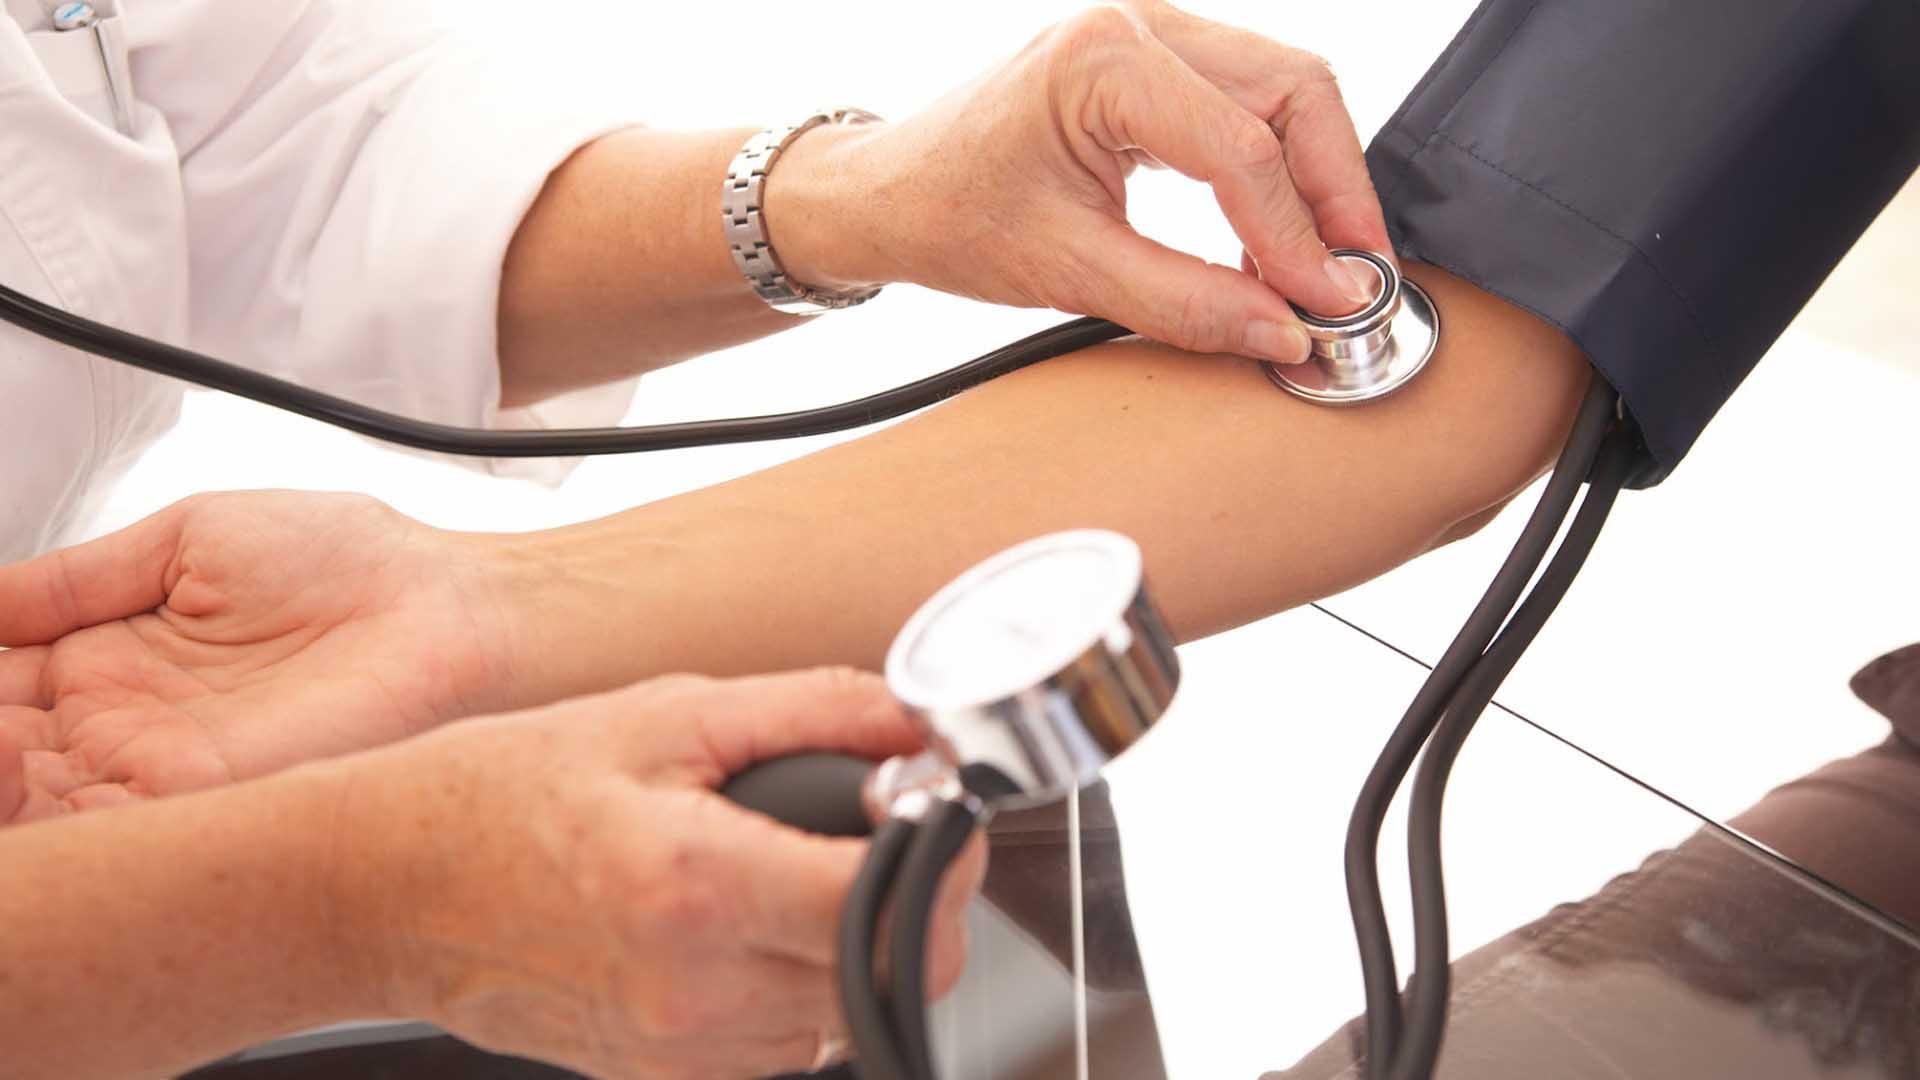 Presión arterial salud australiana